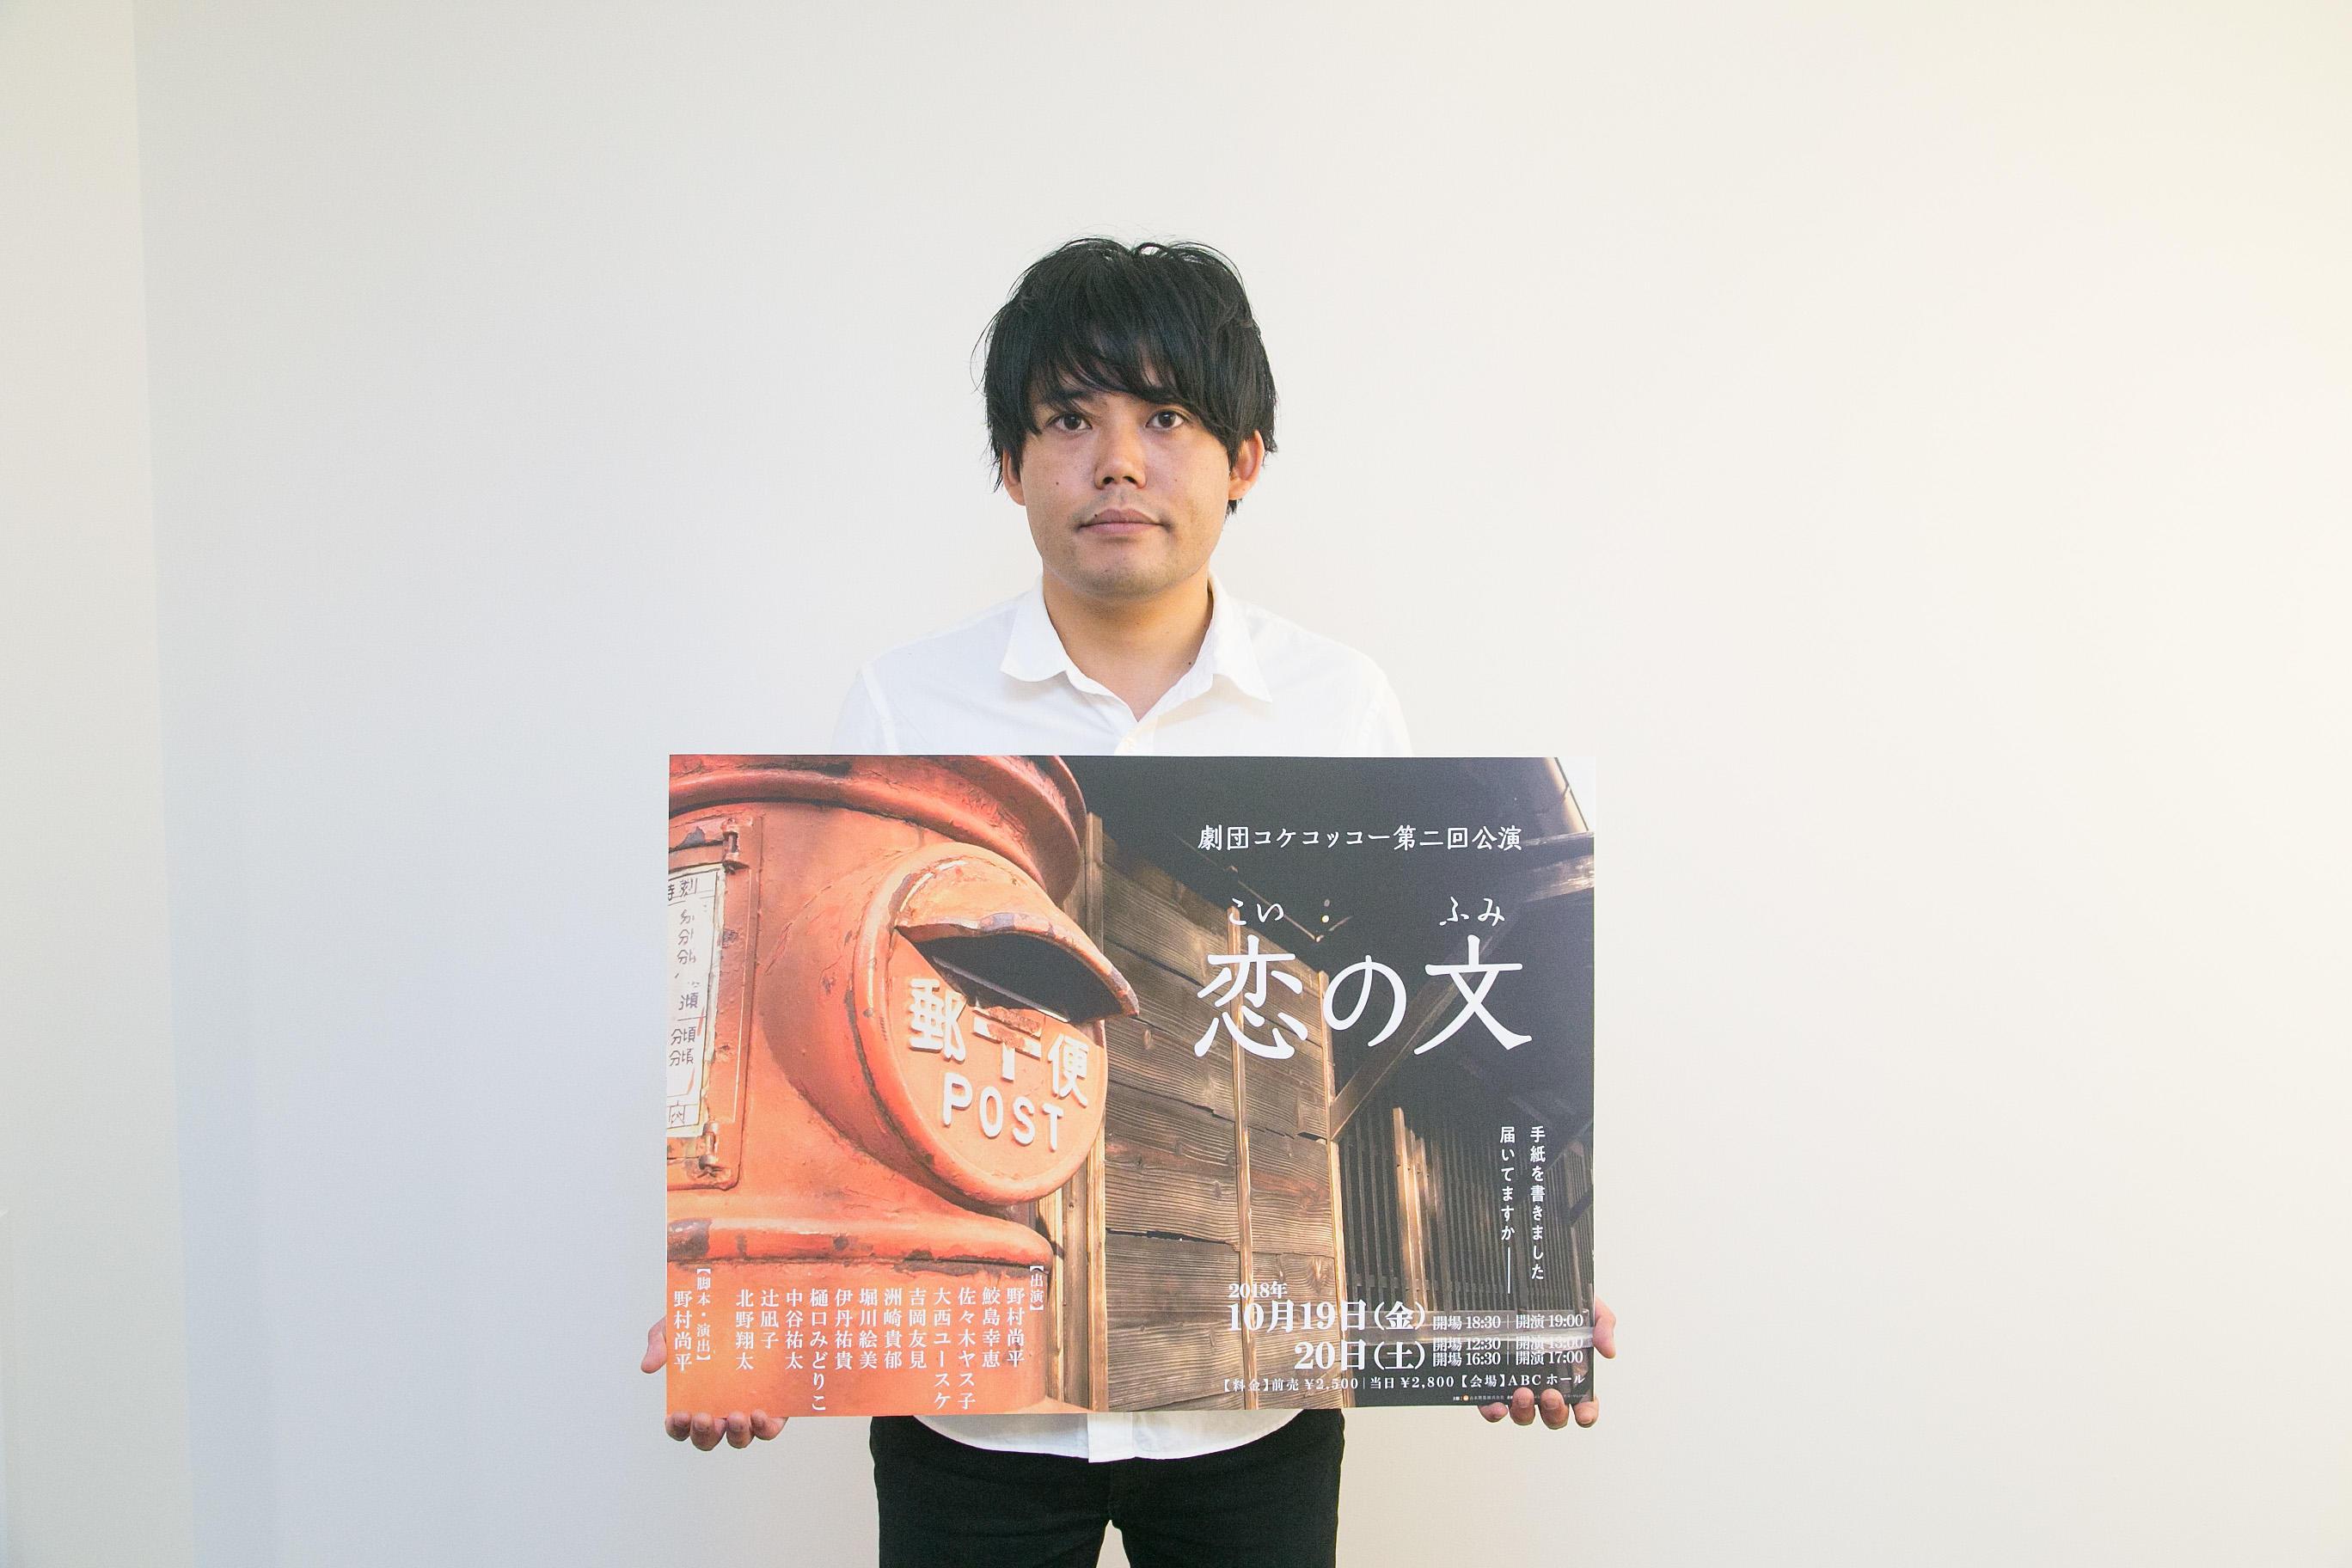 http://news.yoshimoto.co.jp/20180803180629-318addee13b30722b9928dad8ddd5f07ba0d2366.jpg